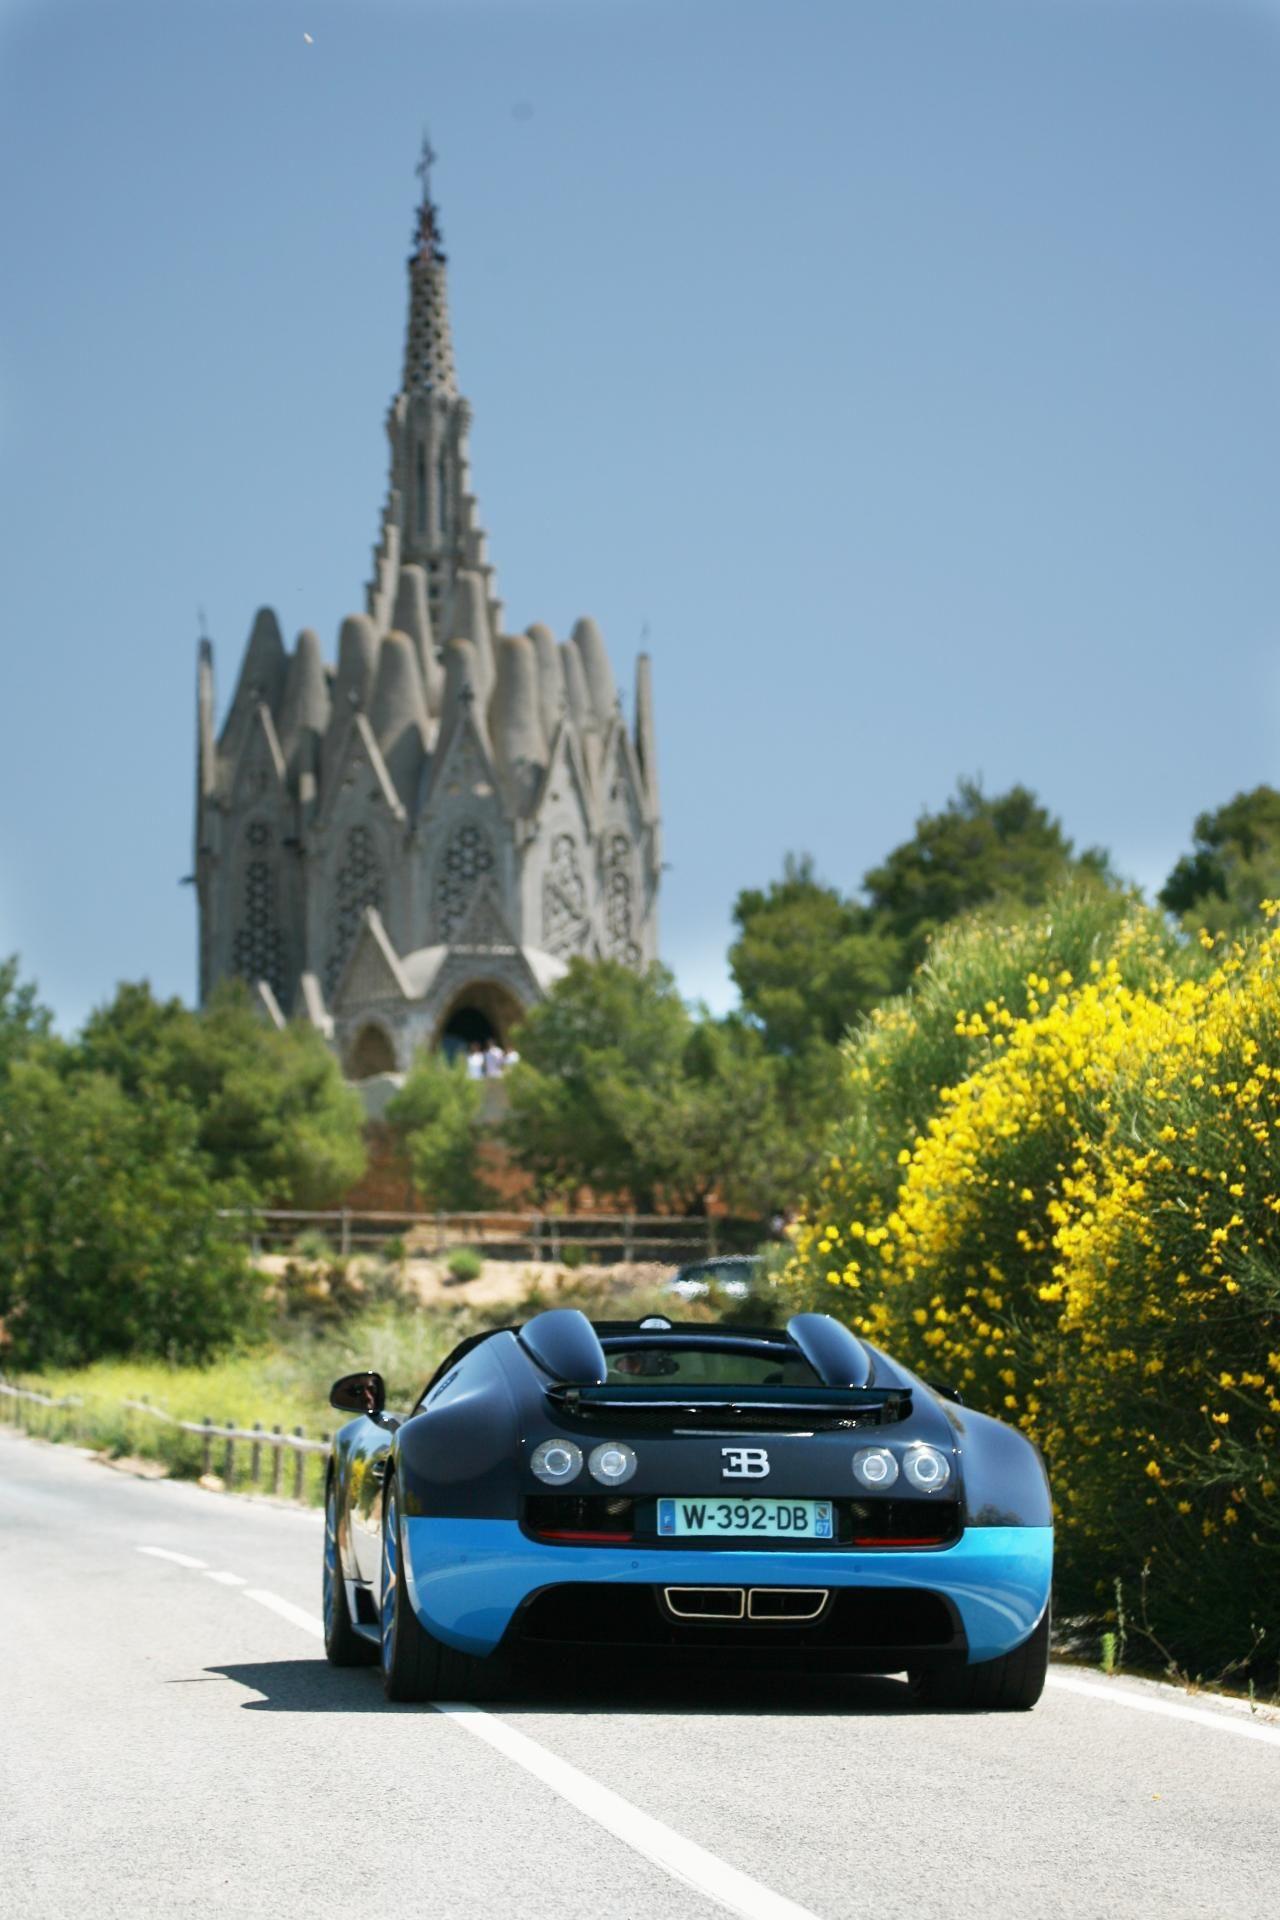 5da52f5cffe7c6a49f9bc1aec12bccb7 Terrific Bugatti Veyron 16.4 Grand Sport Vitesse Prix Cars Trend